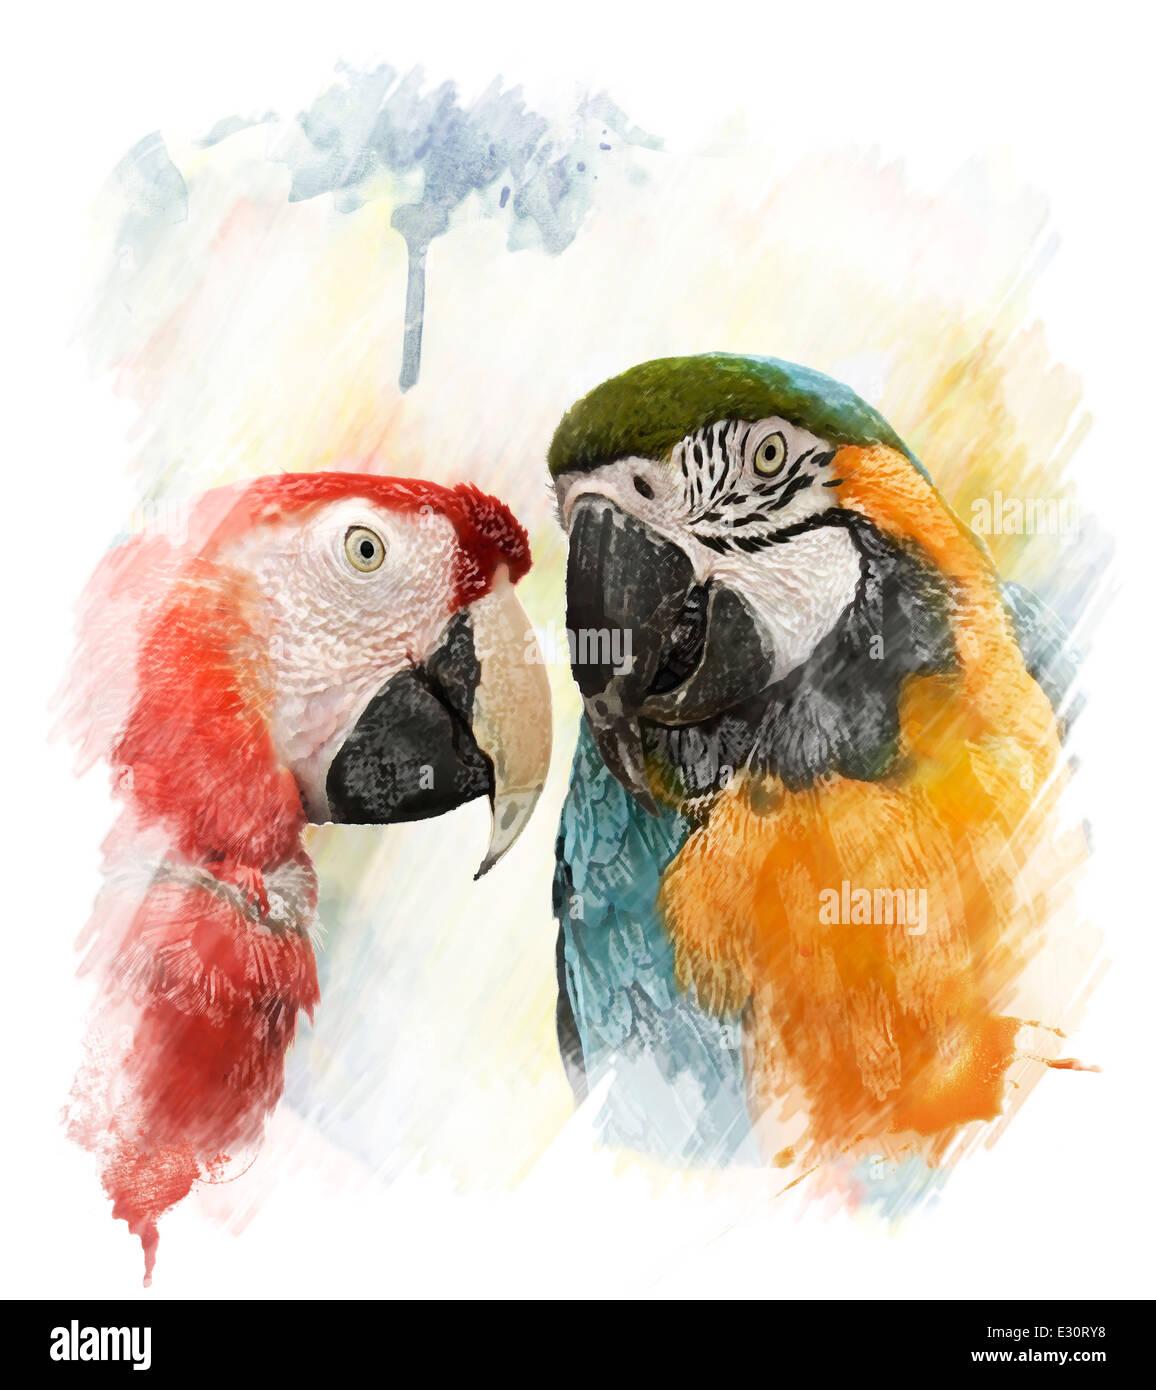 Acuarela pintura digital de dos loros coloridos Imagen De Stock